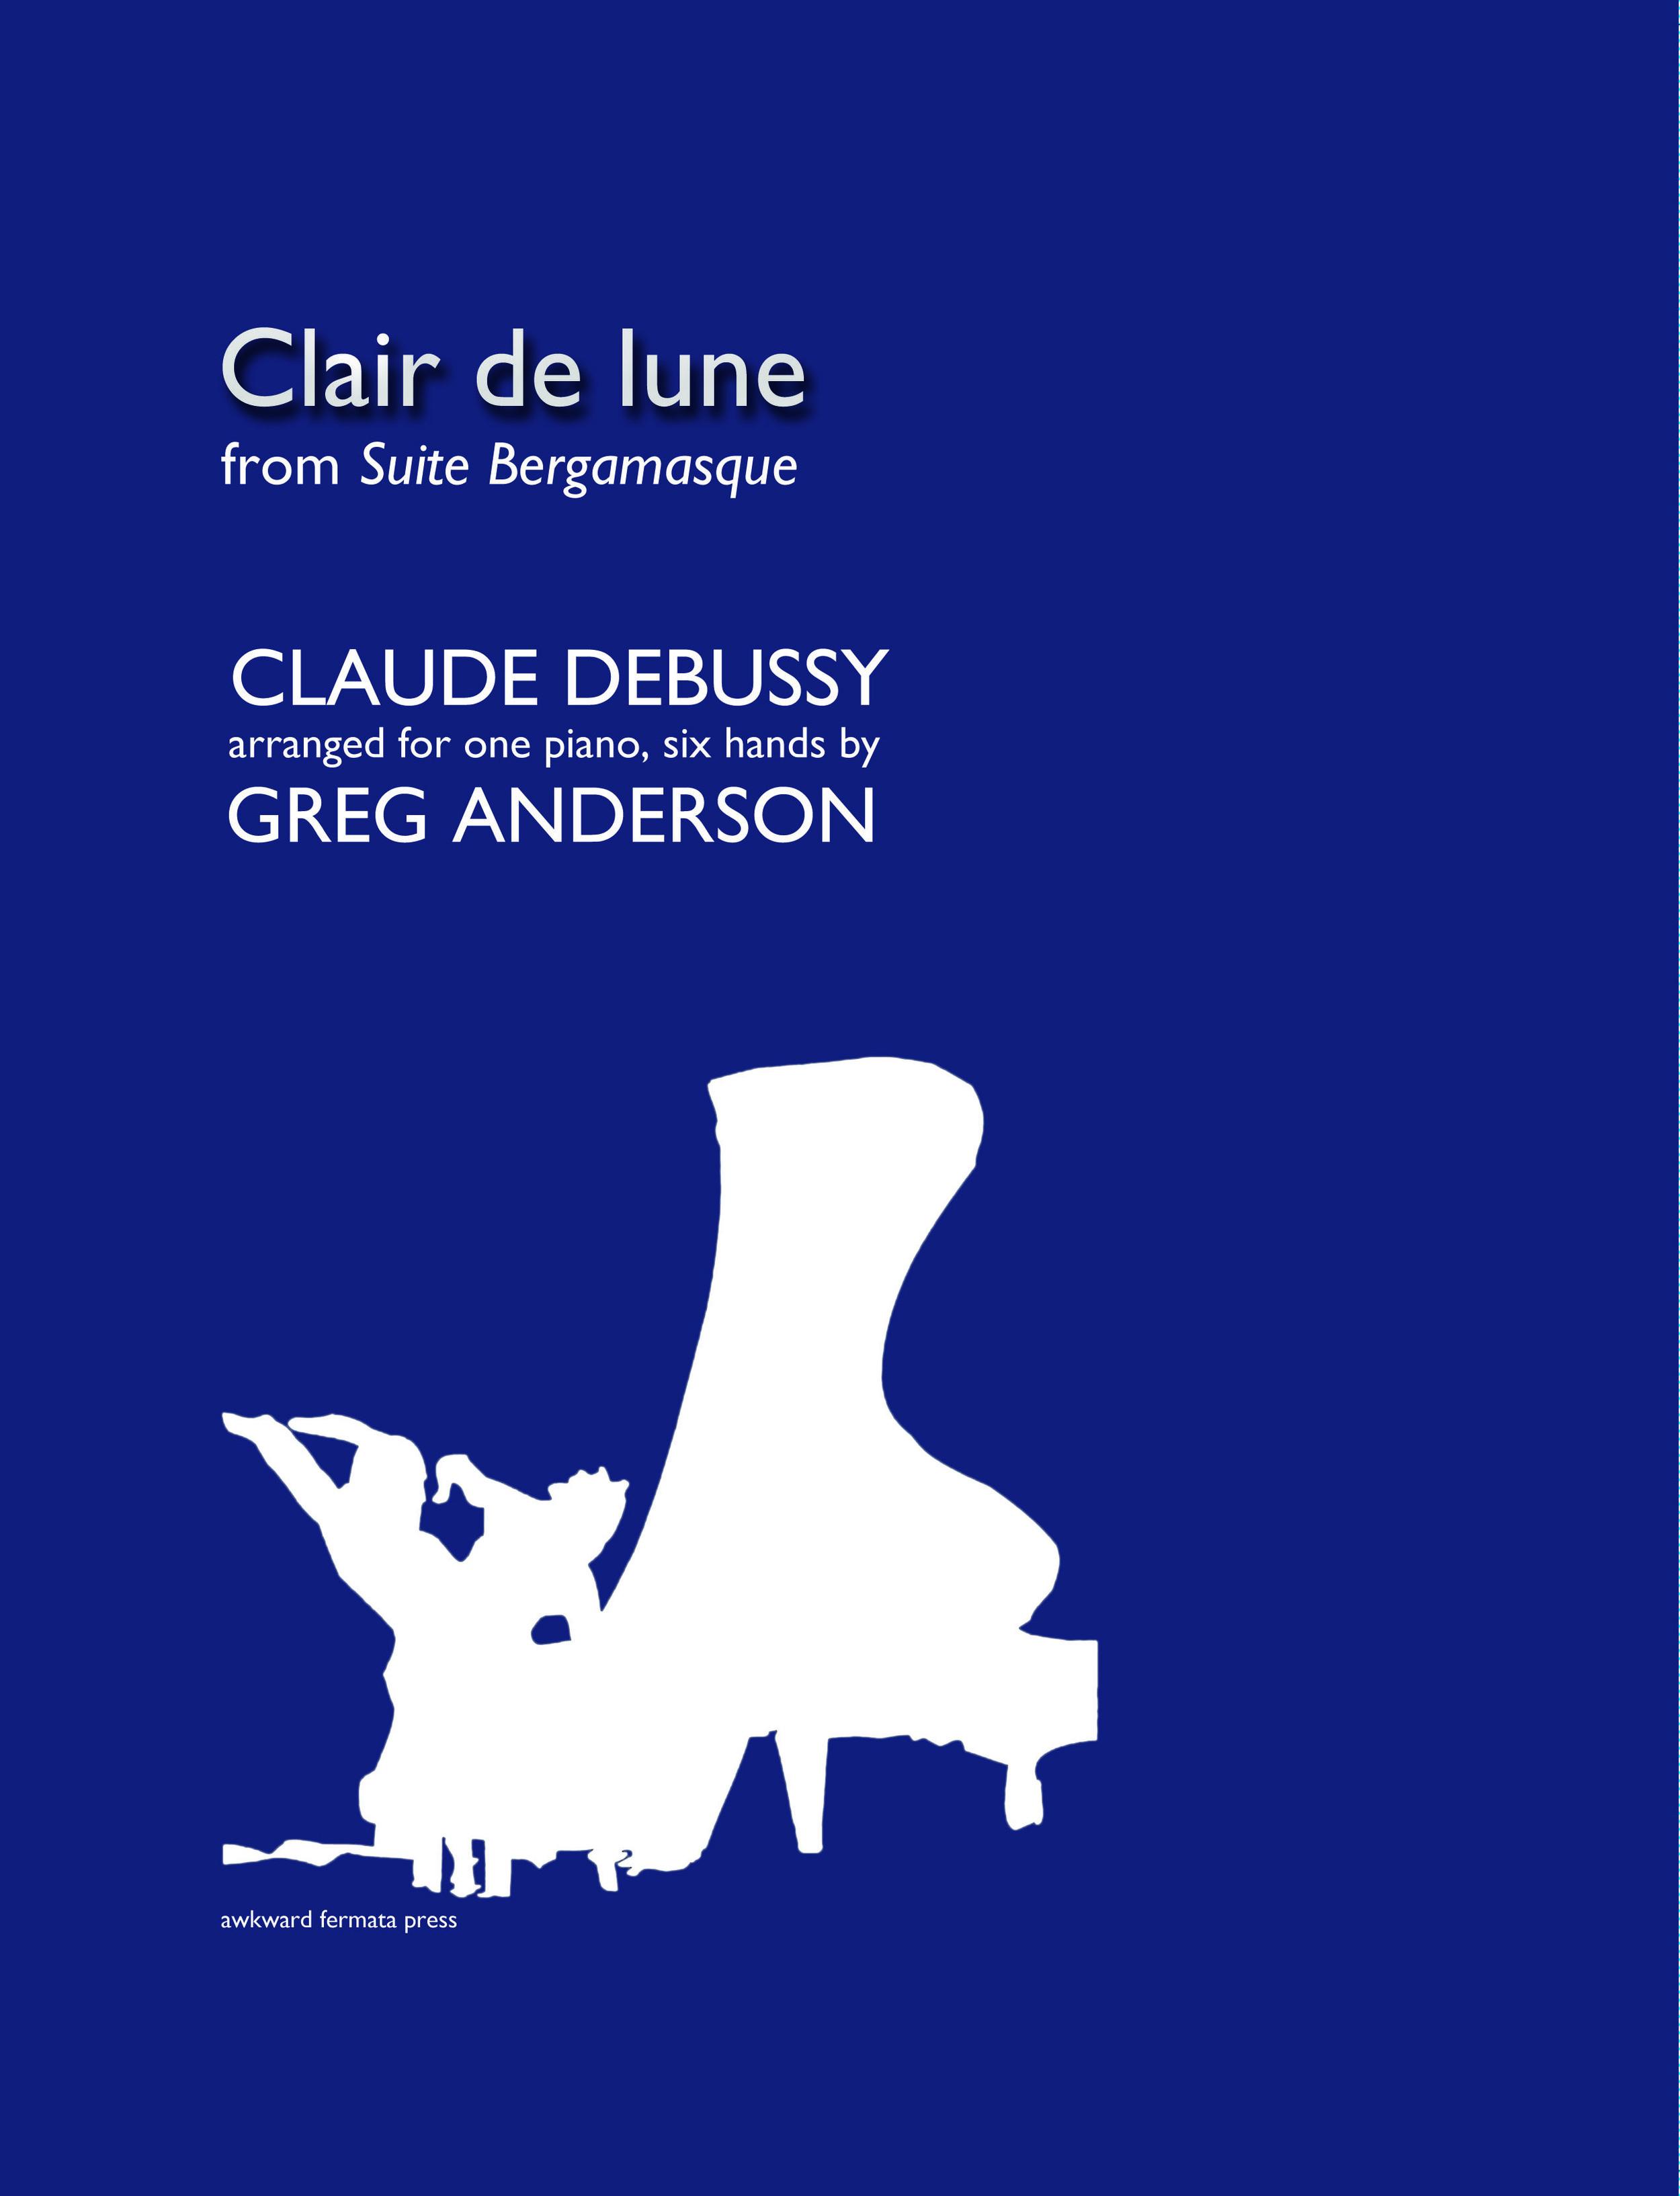 acheter populaire 37c46 b6120 DEBUSSY: </br>Clair de lune (6 hands) — GREG ANDERSON ...